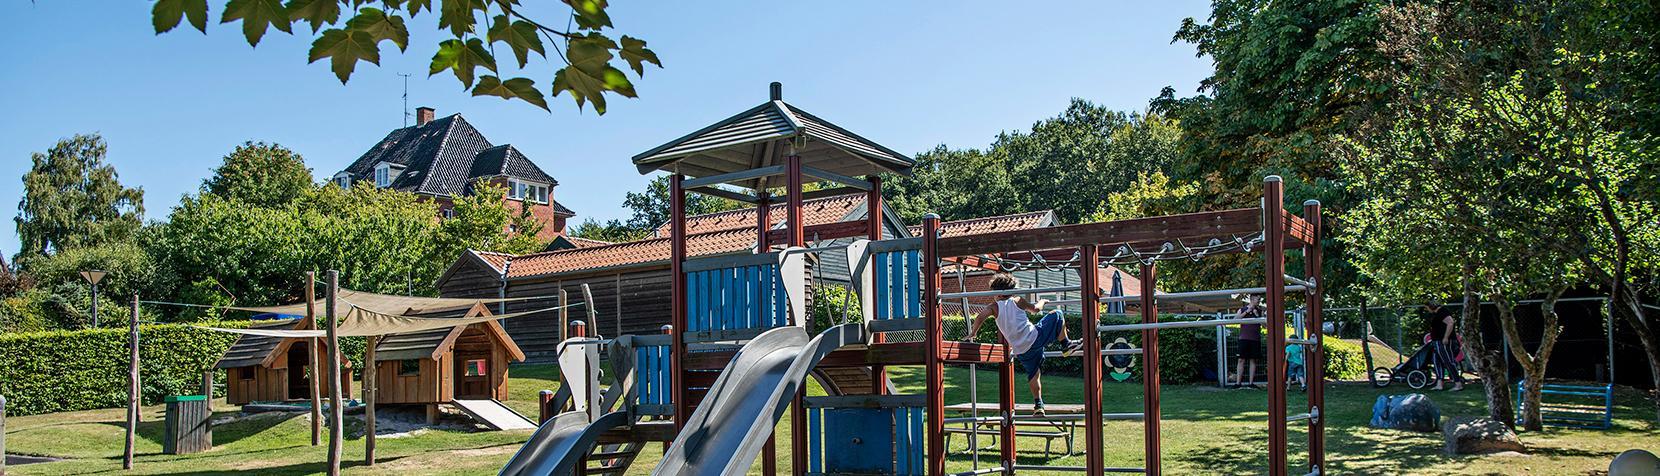 Børnehuset Rudegårds Allés legeplads